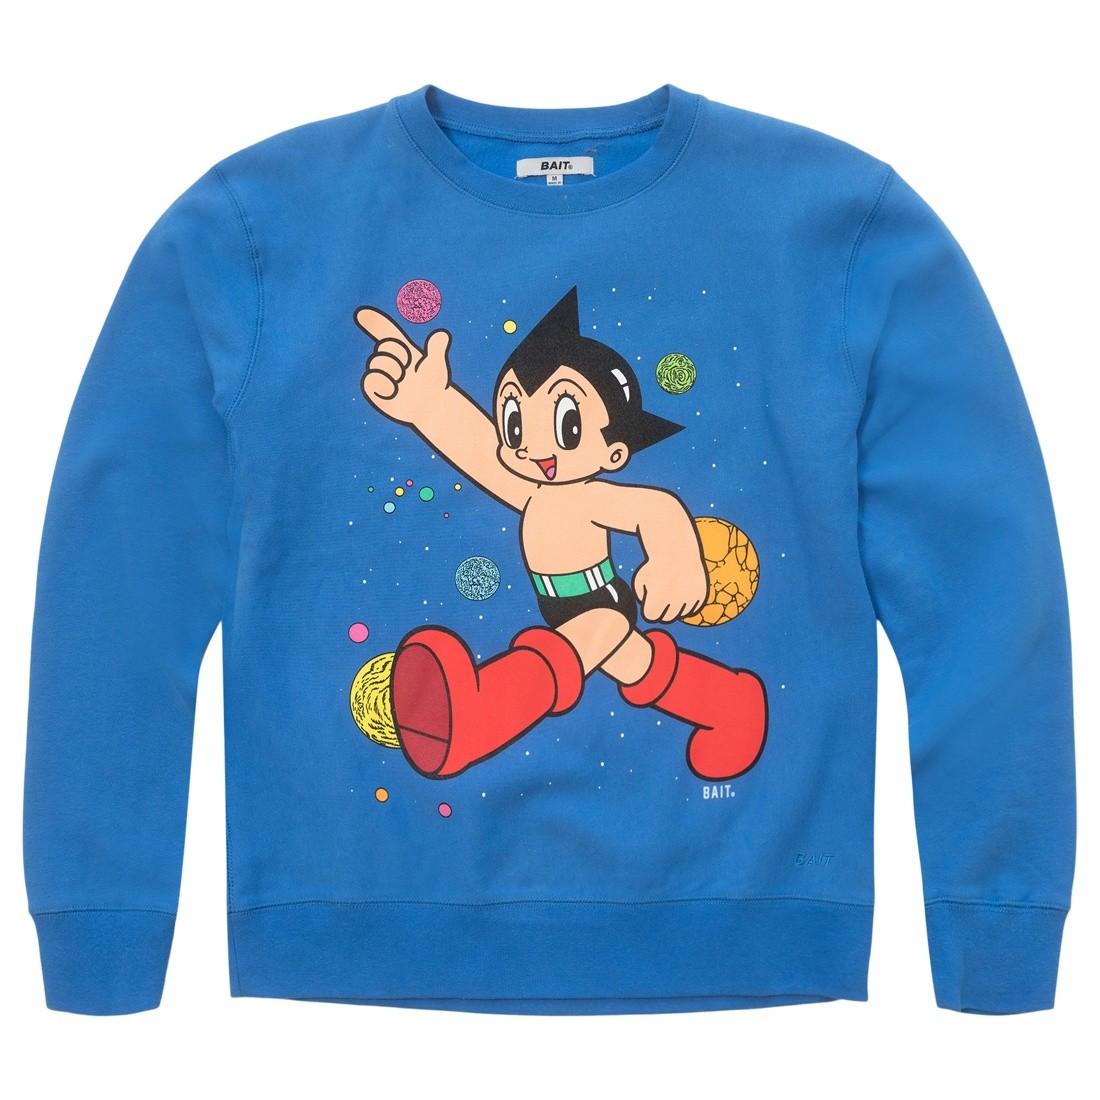 BAIT x Astro Boy Men Space Puff Print Premium Crewneck Sweater (blue)